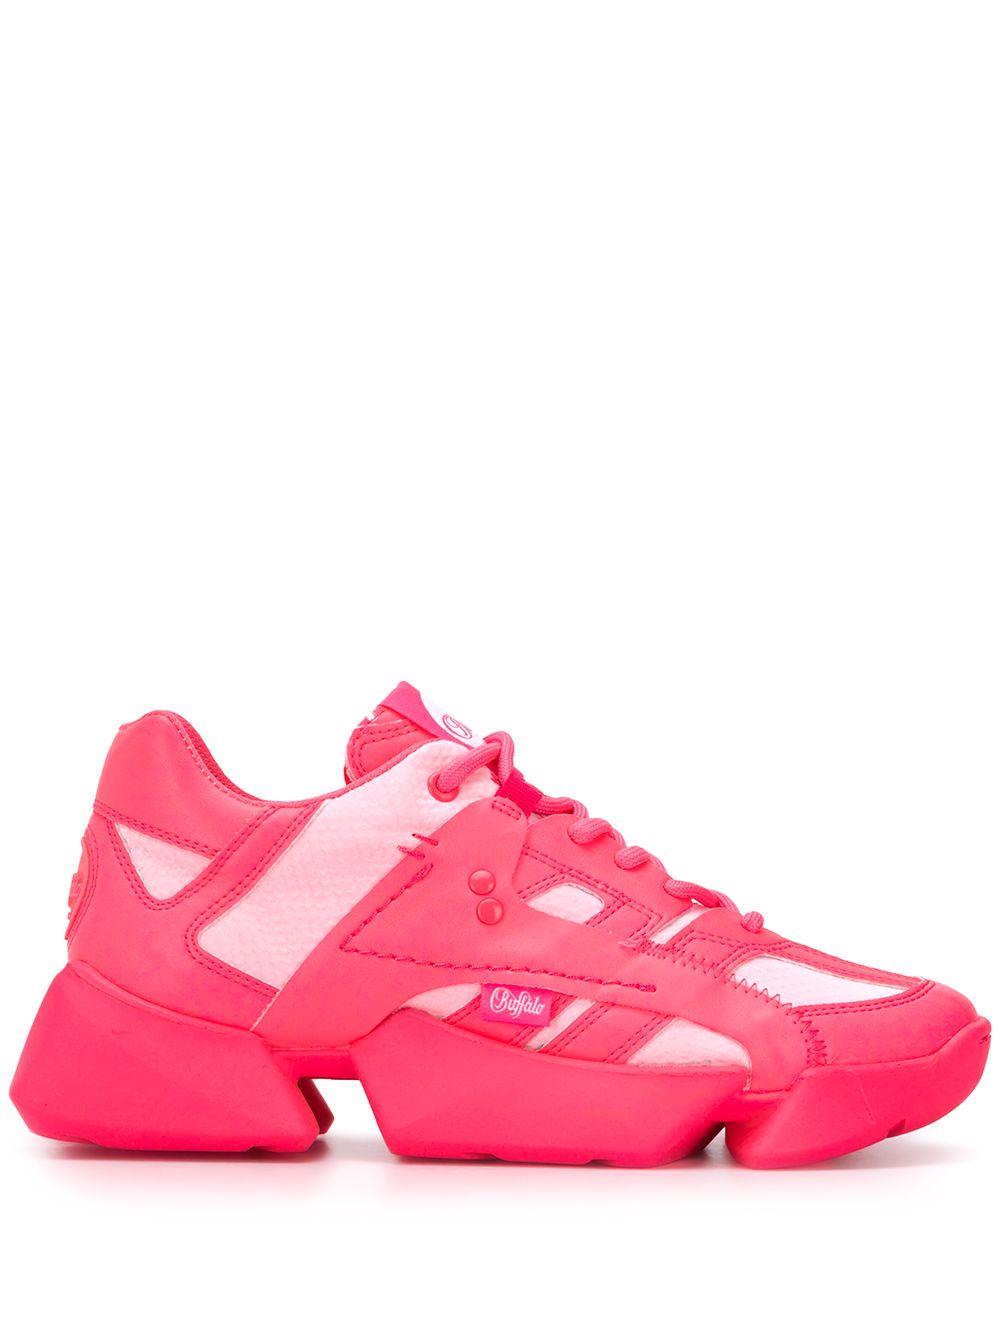 Baffalo Sneakers